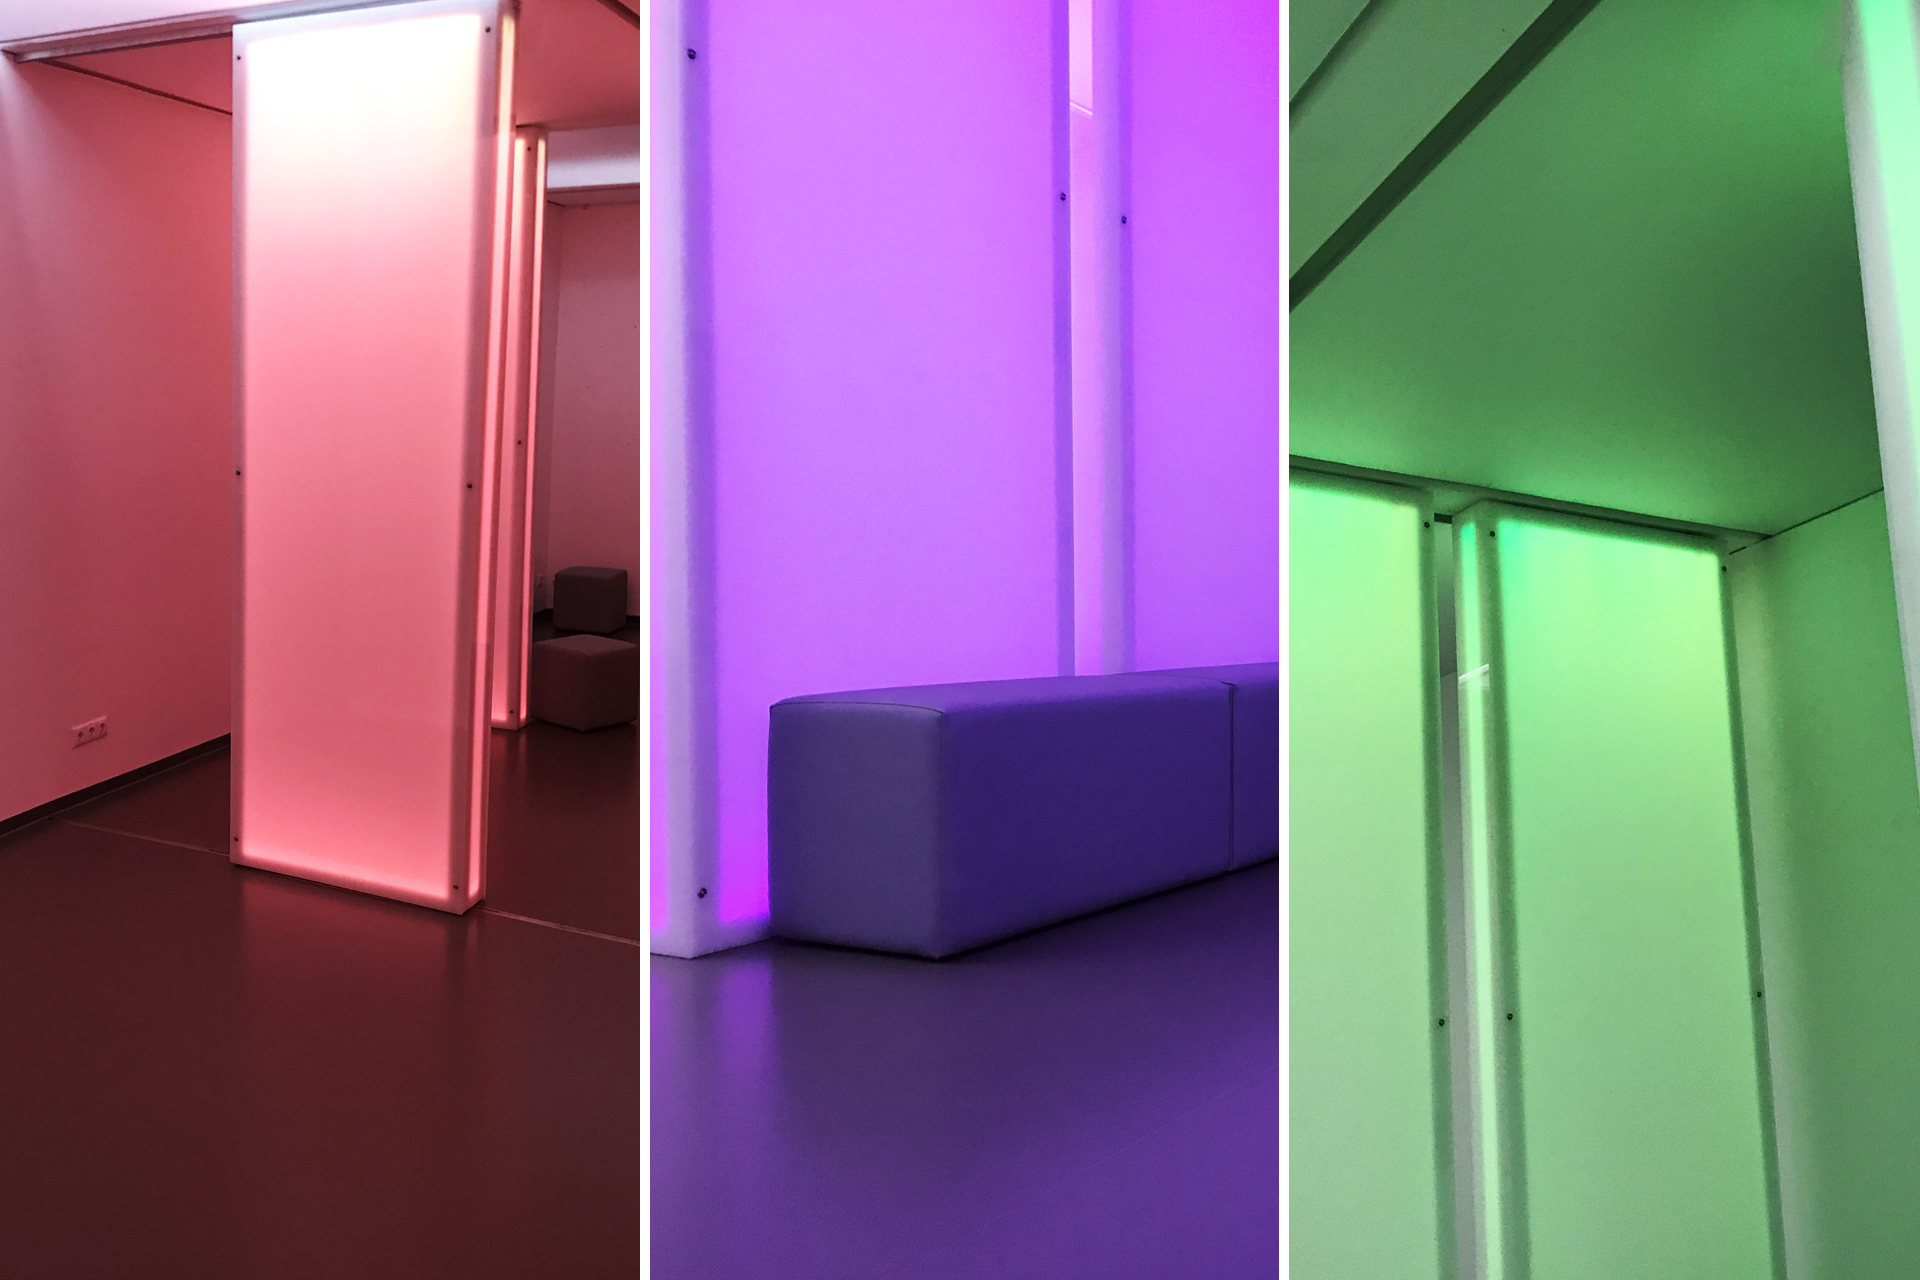 raum der stille er ffnet universit t siegen. Black Bedroom Furniture Sets. Home Design Ideas